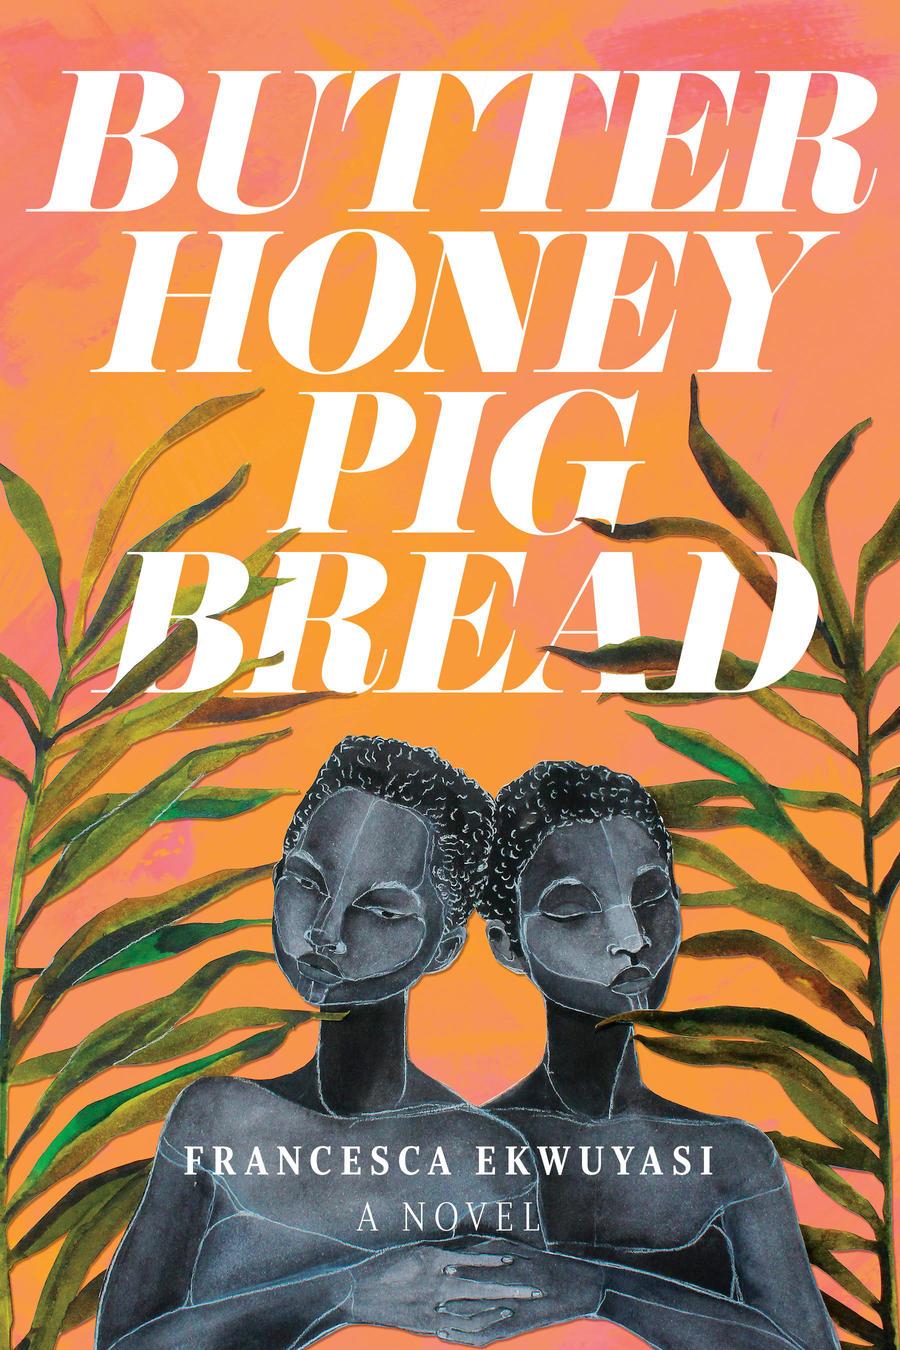 Ekwuyasi Francesca Butter Honey Pig Bread Book cover